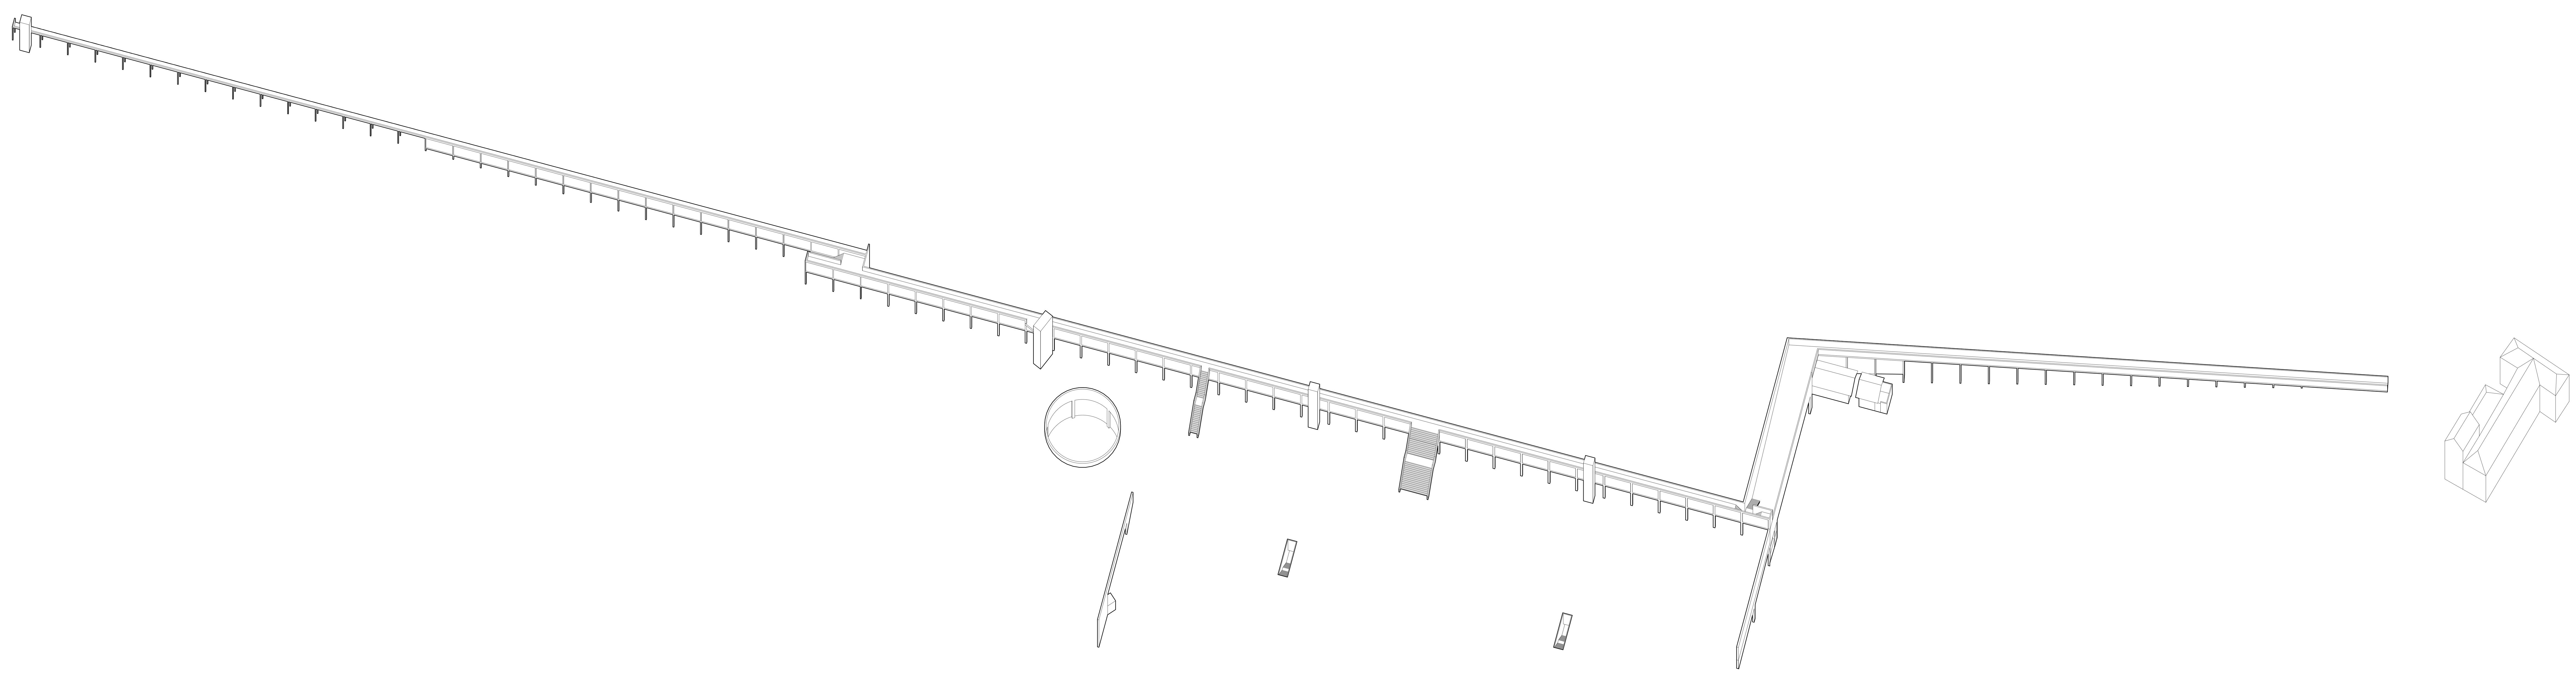 178_axonometria